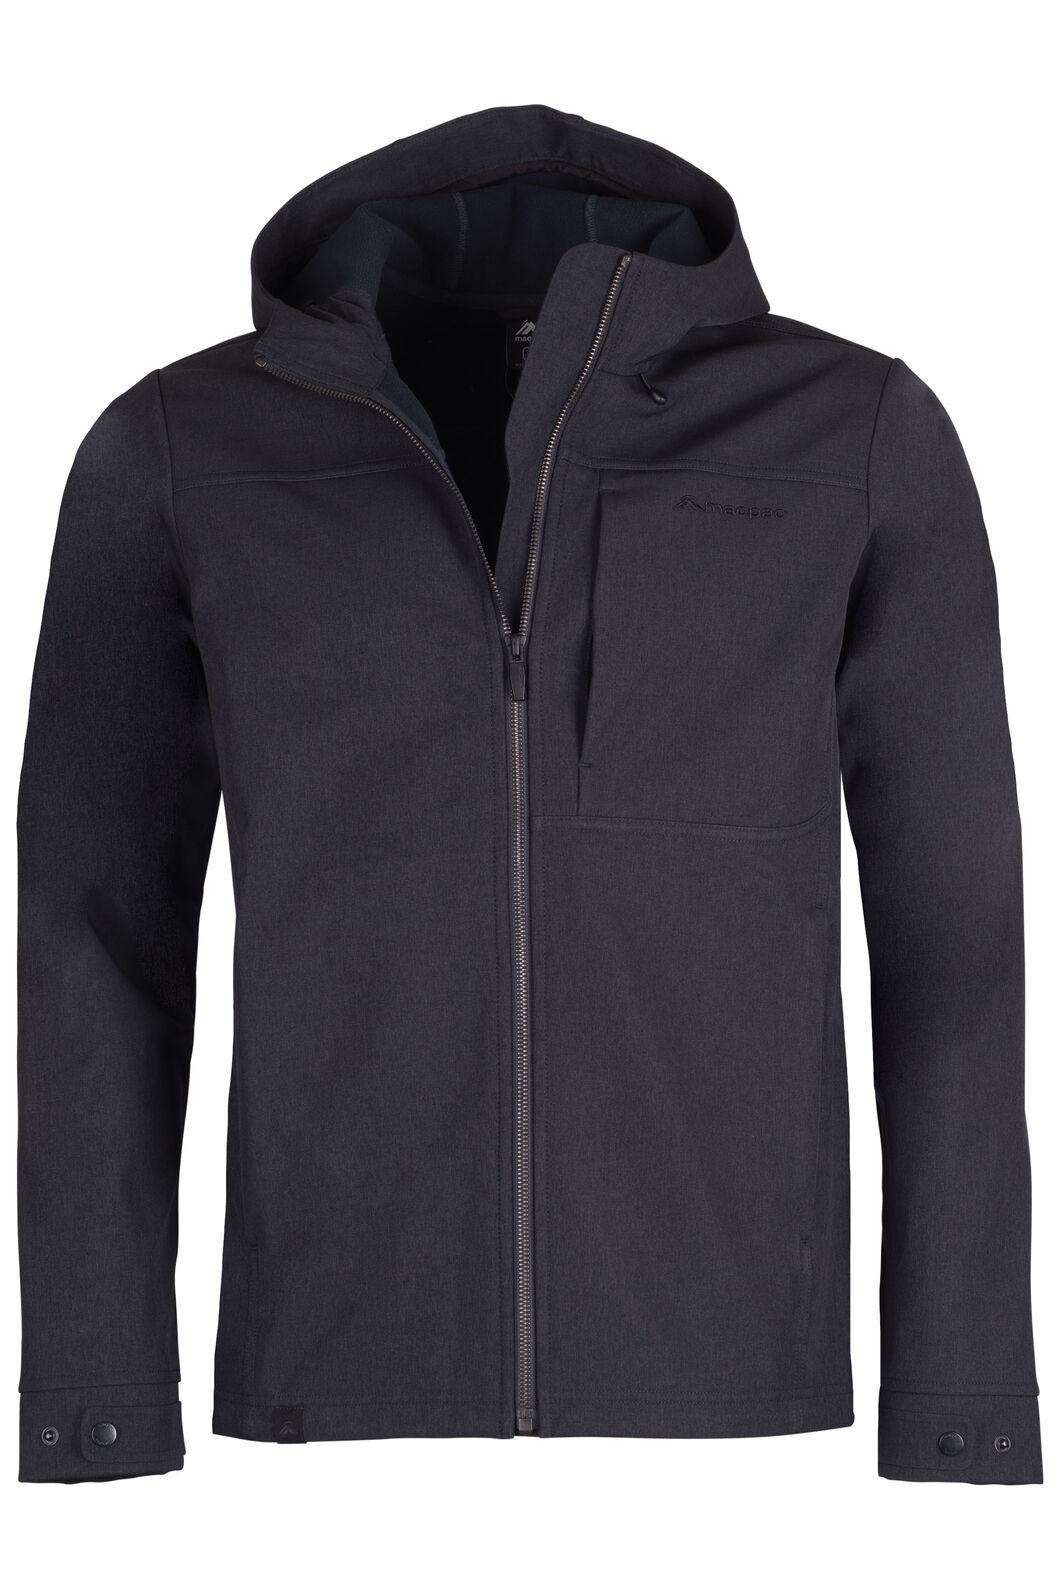 Macpac Chord Hooded Softshell Jacket - Men's, Black, hi-res